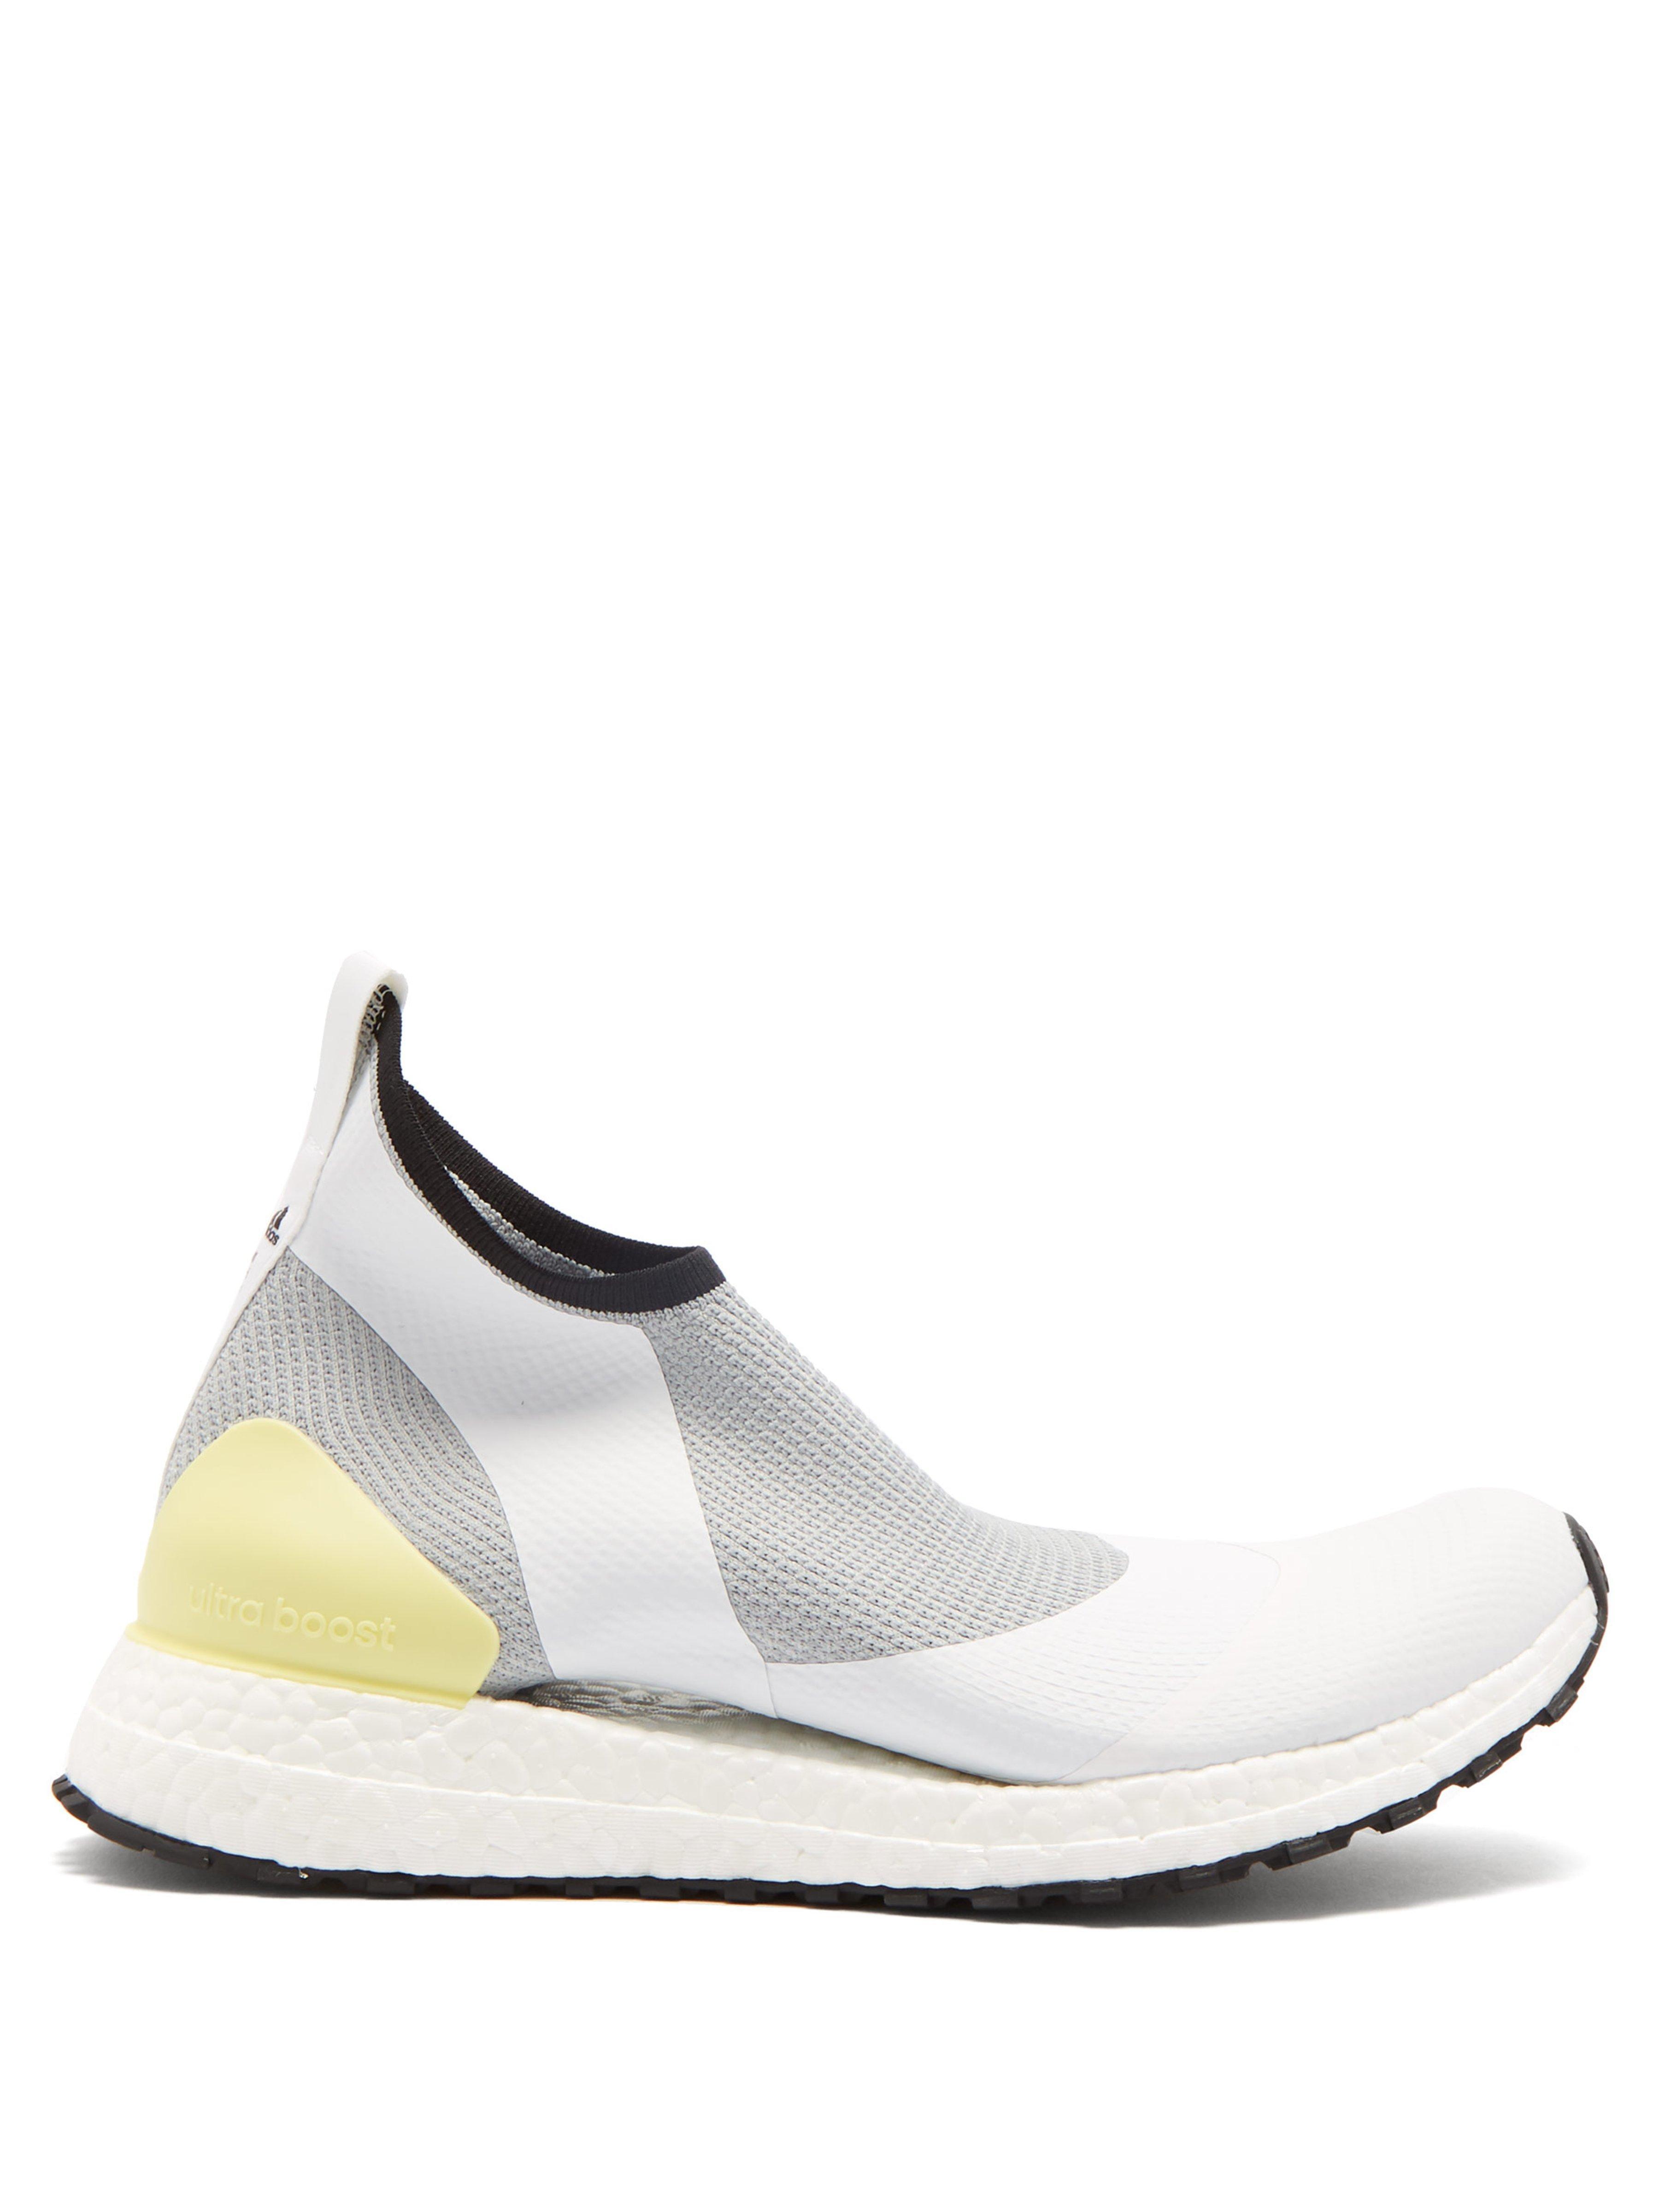 596edb66af849 adidas By Stella McCartney Ultraboost X Low Top Trainers in White - Lyst